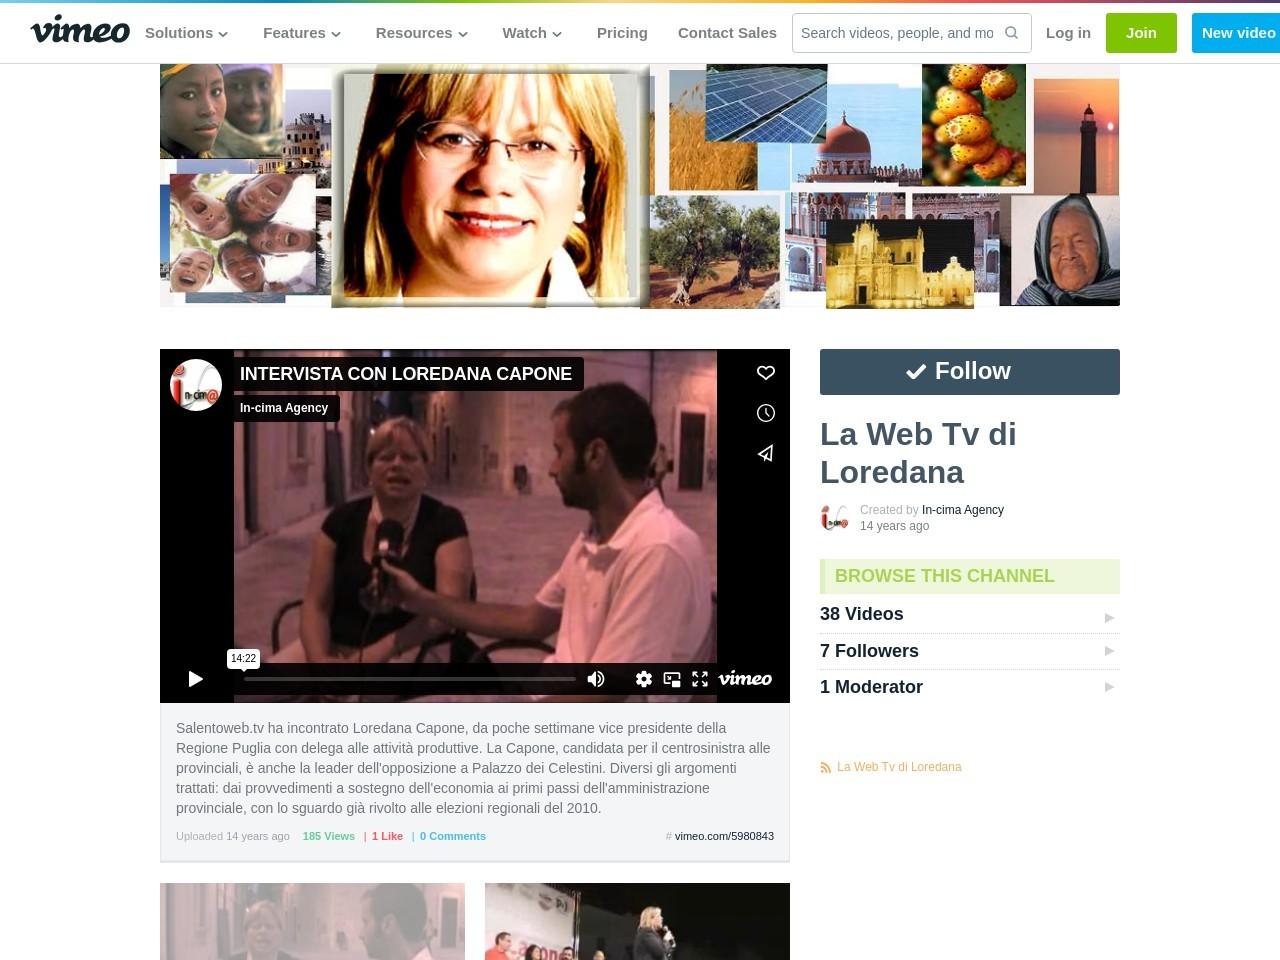 la-web-tv-di-loredana